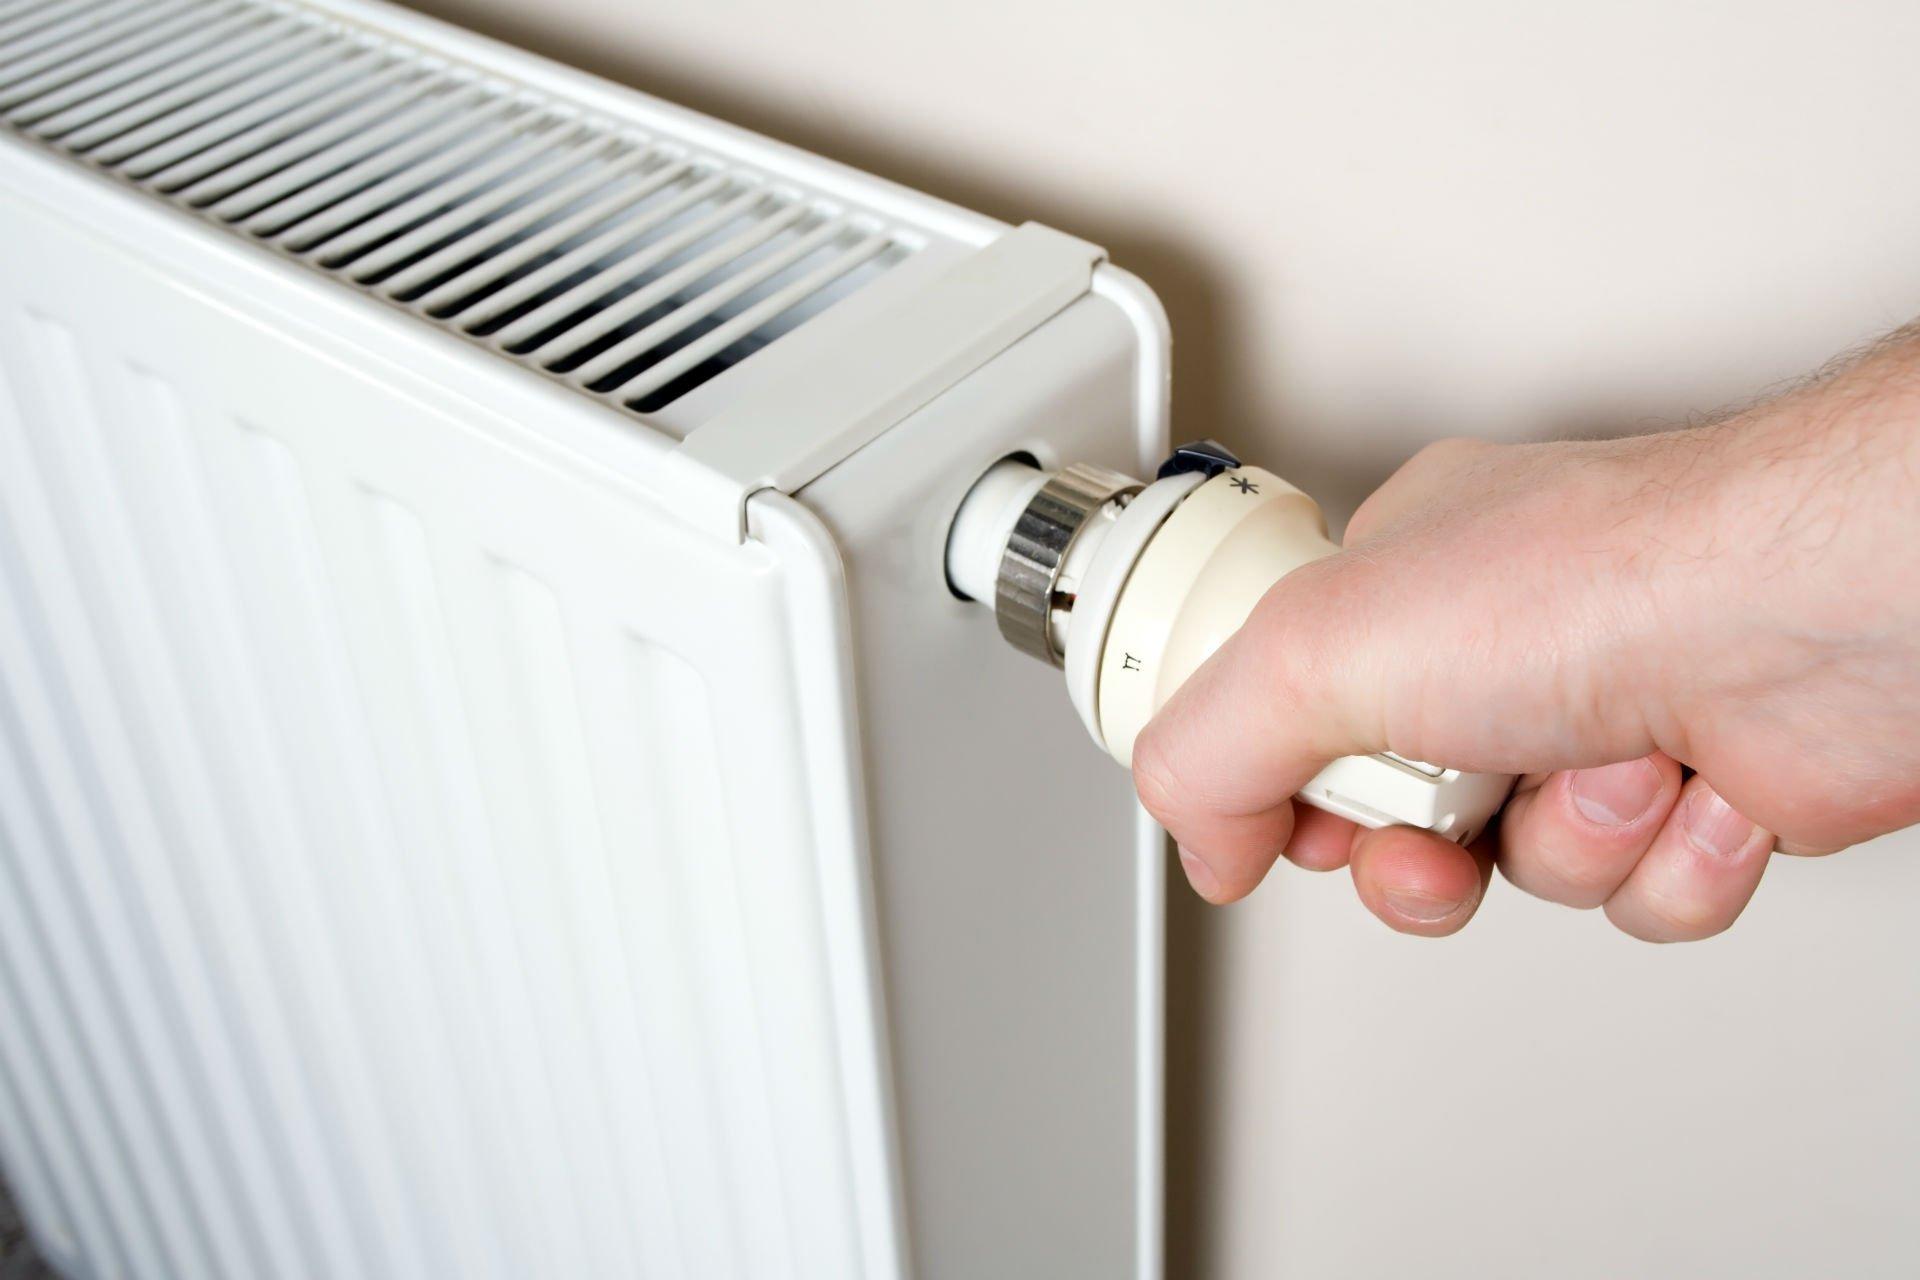 valvola termosifone regola temperatura